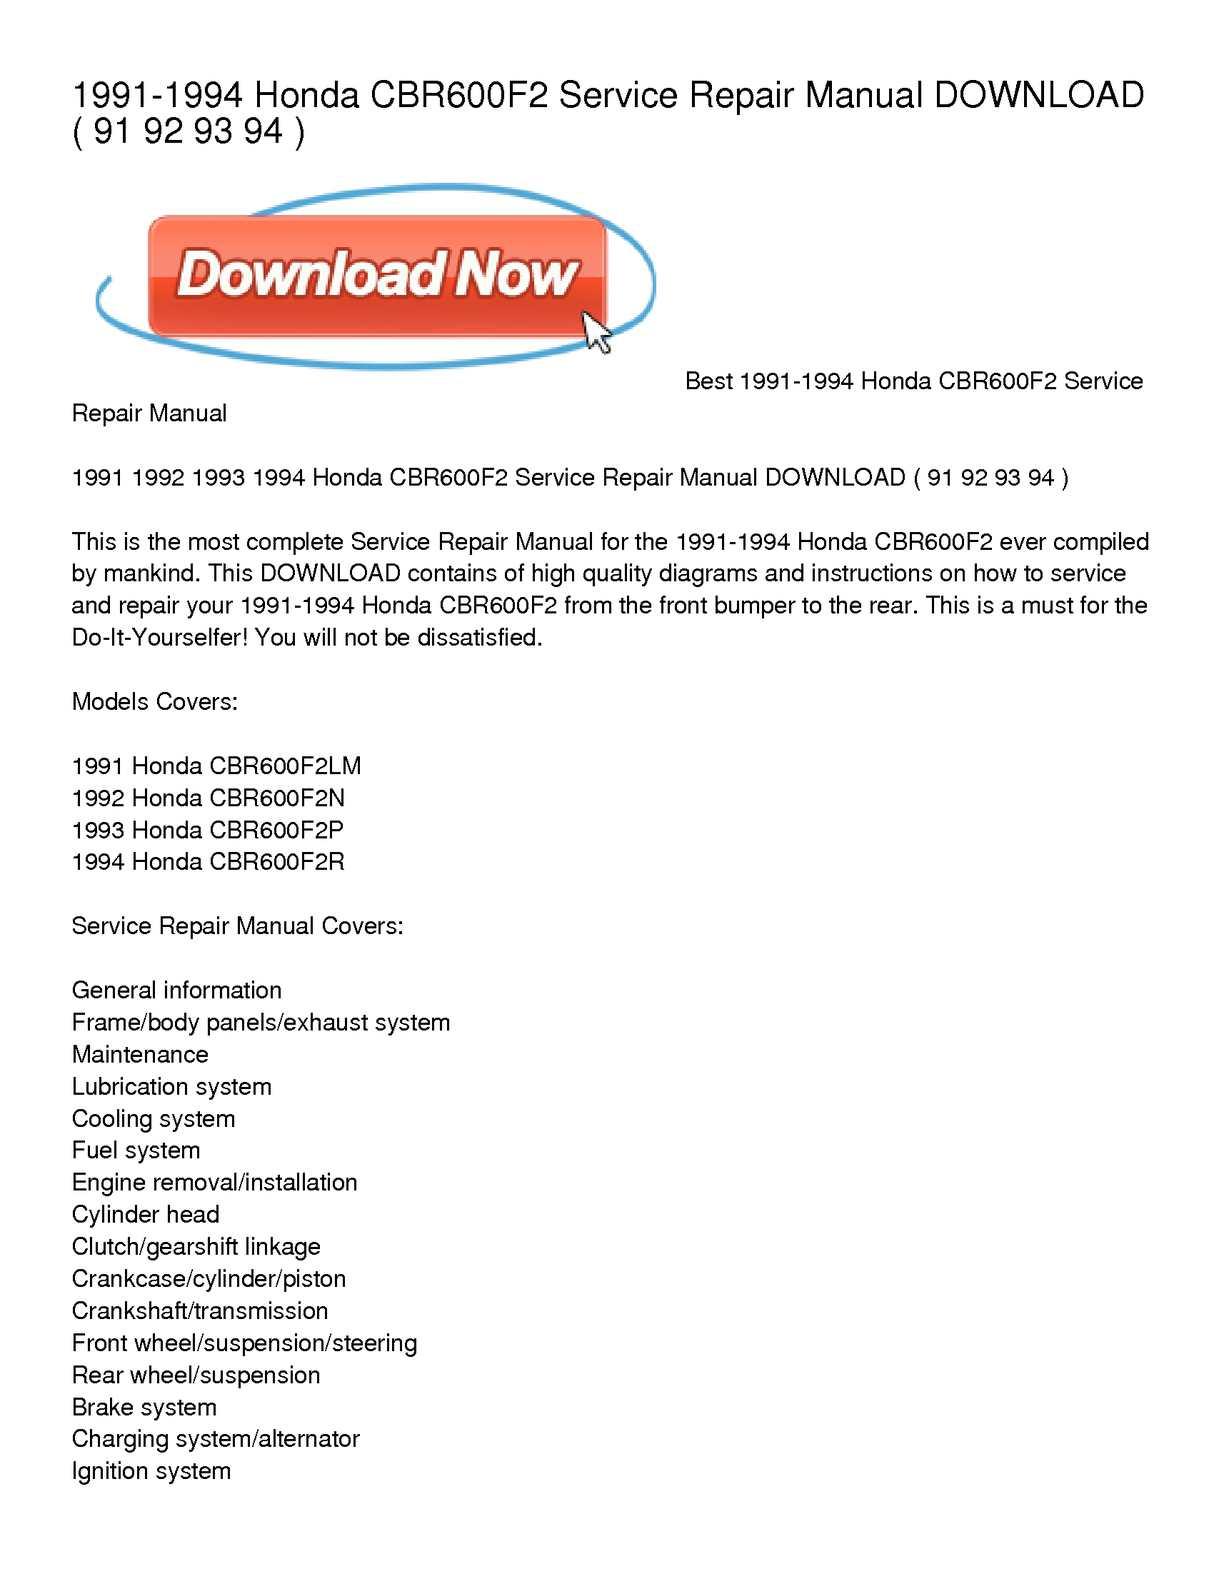 hight resolution of 1991 1994 honda cbr600f2 service repair manual download